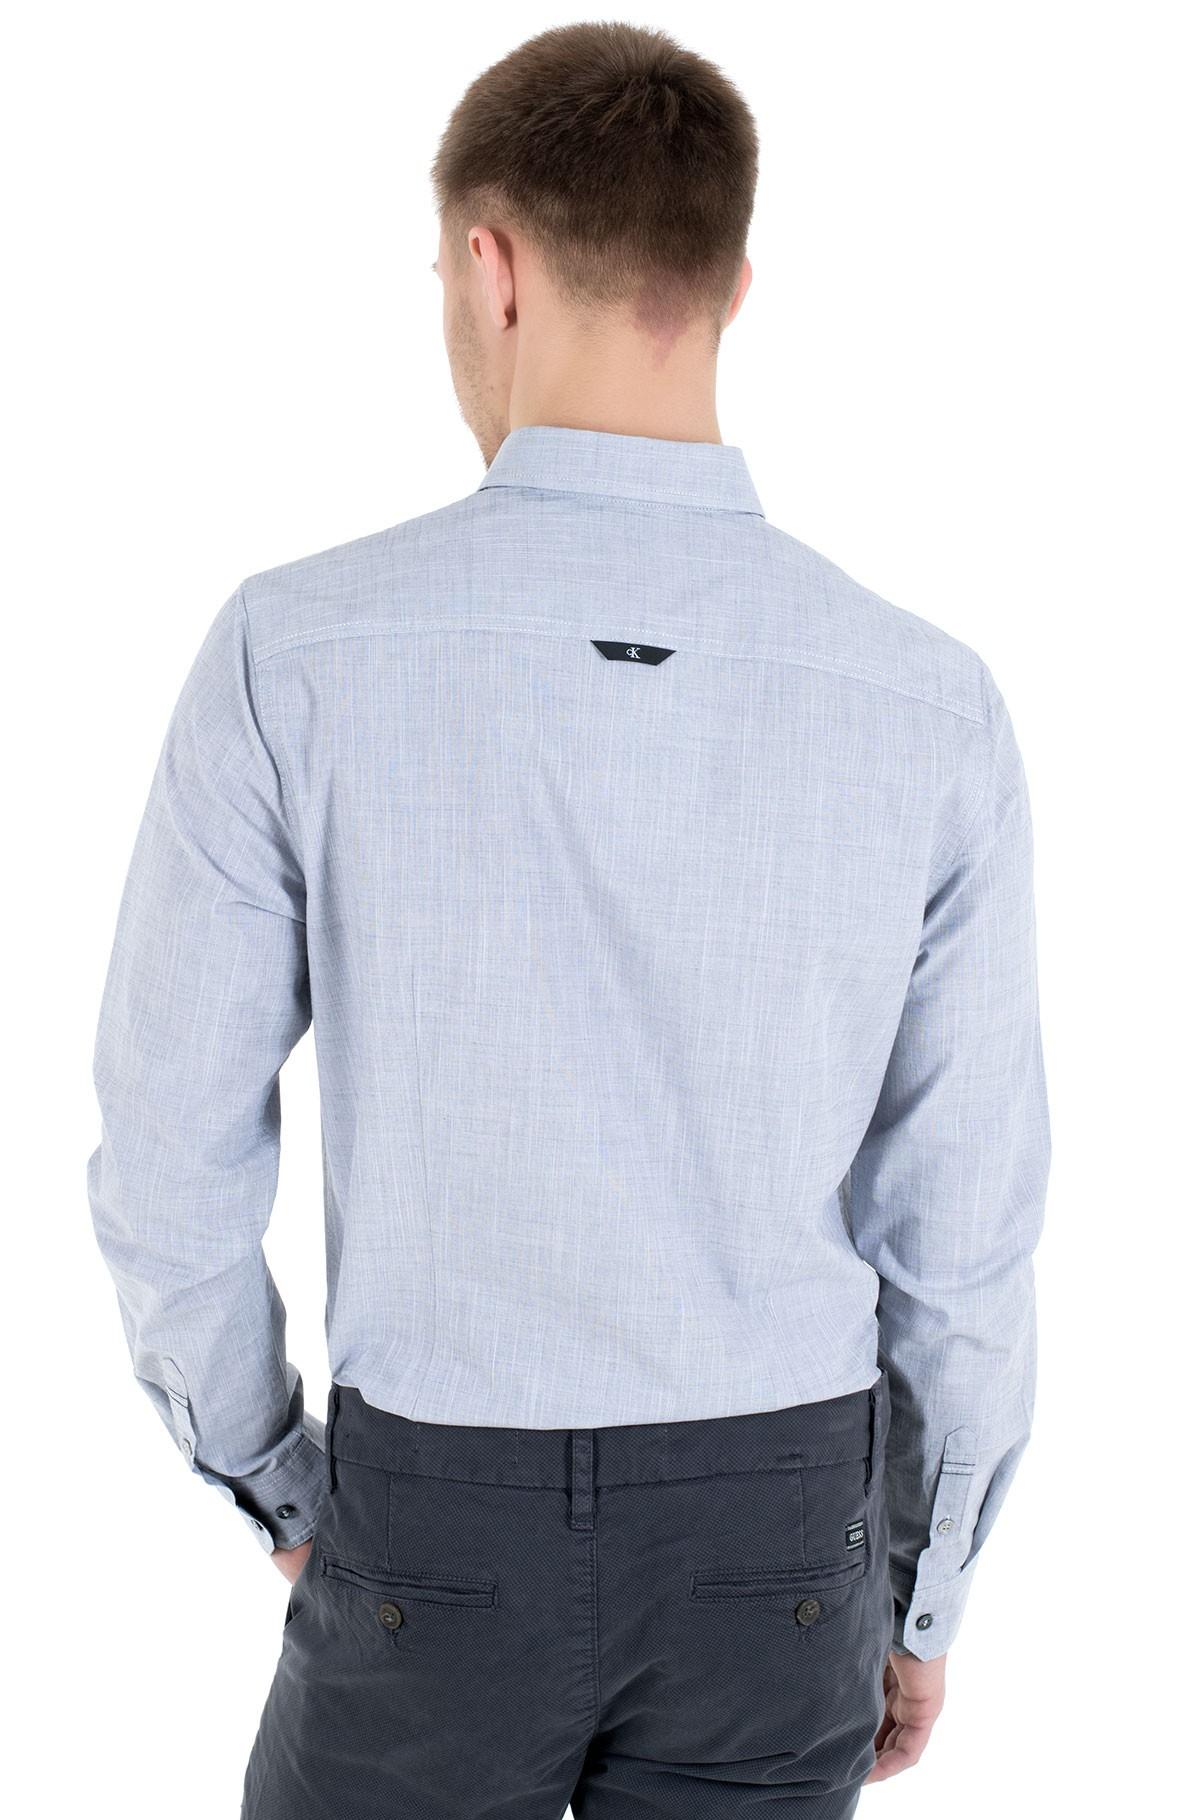 Marškiniai STRUCTURED SLIM STRETCH SHIRT-full-2